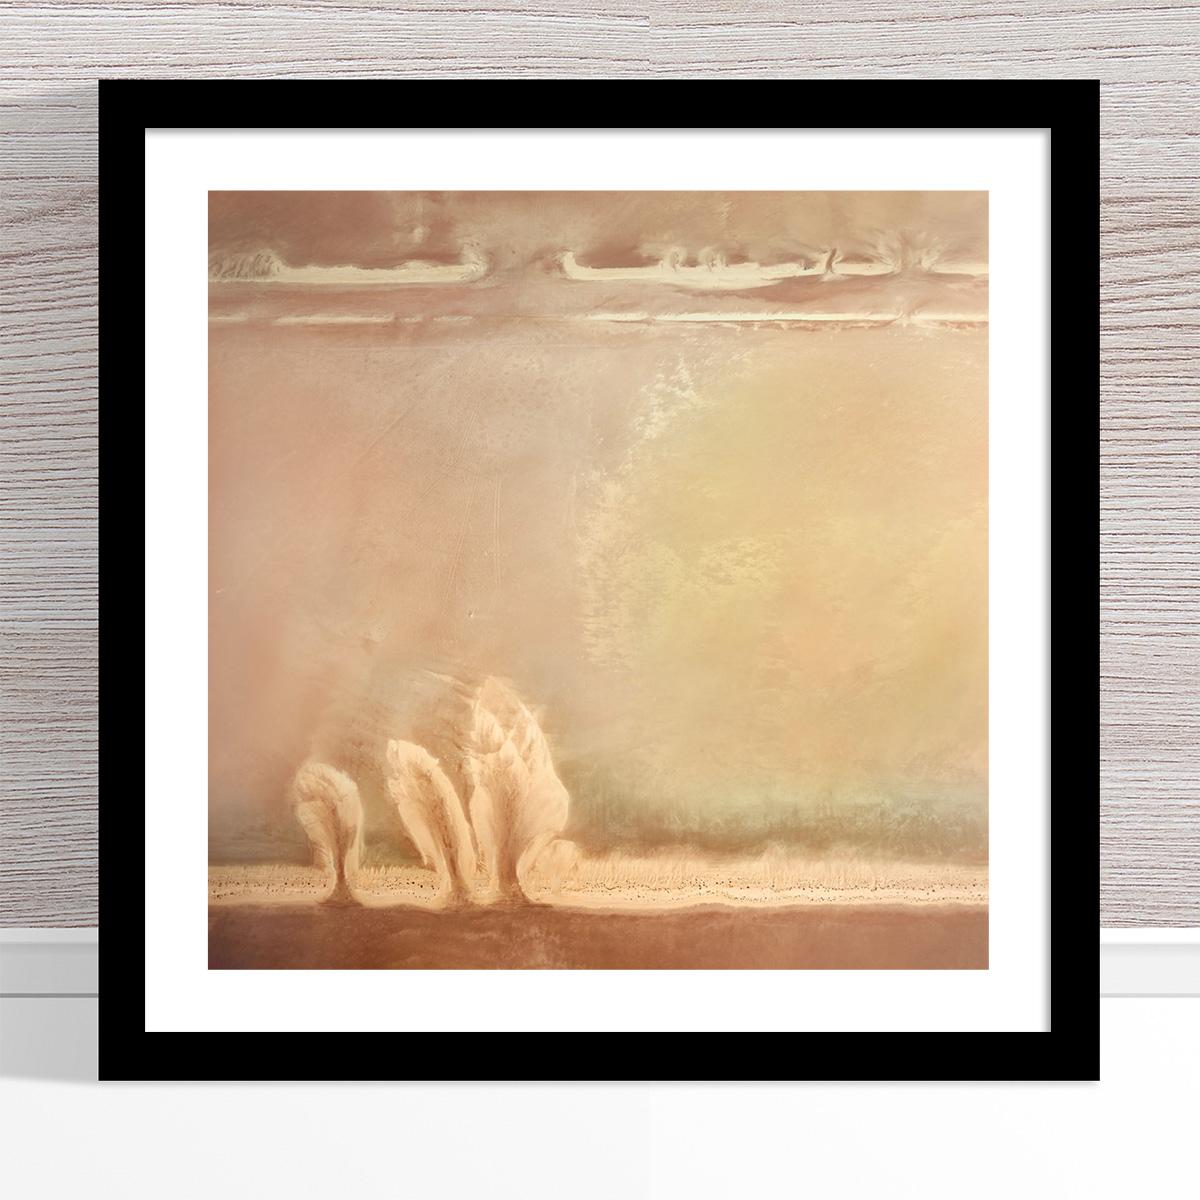 Chris Saunders - 'Aerial Salt 046' Black Frame